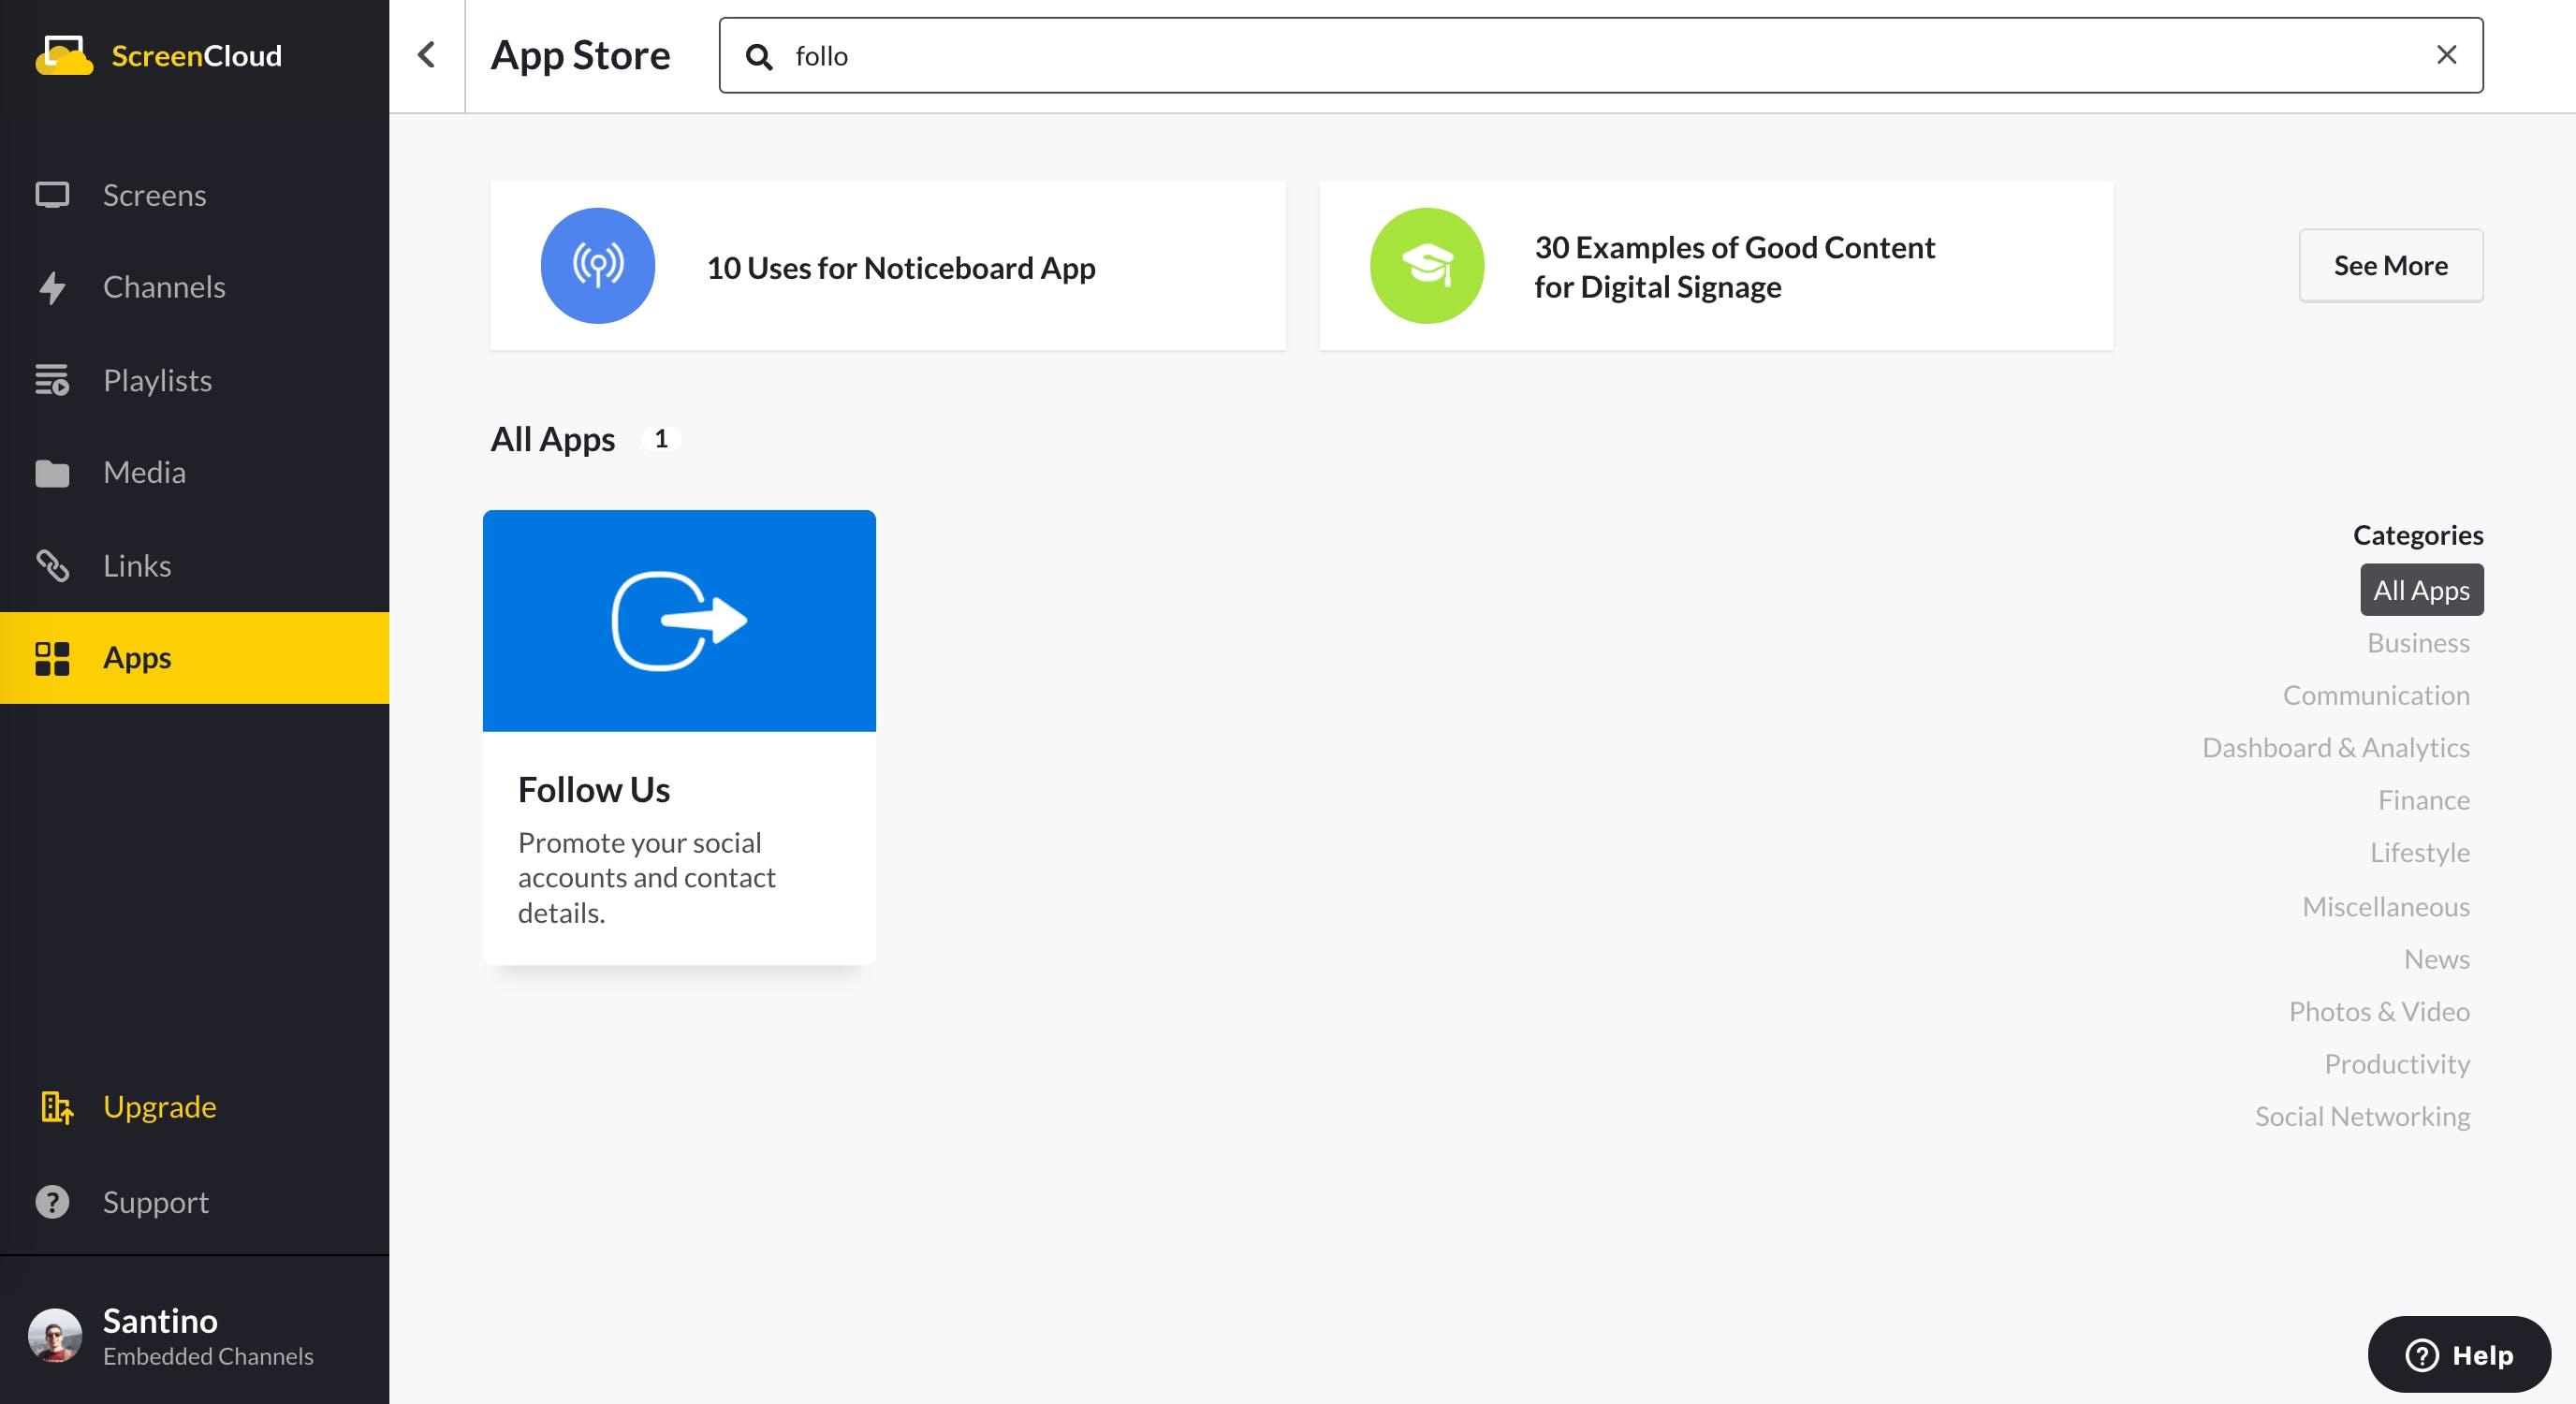 Follow Us App Guide - App Store 5.13.2020.png